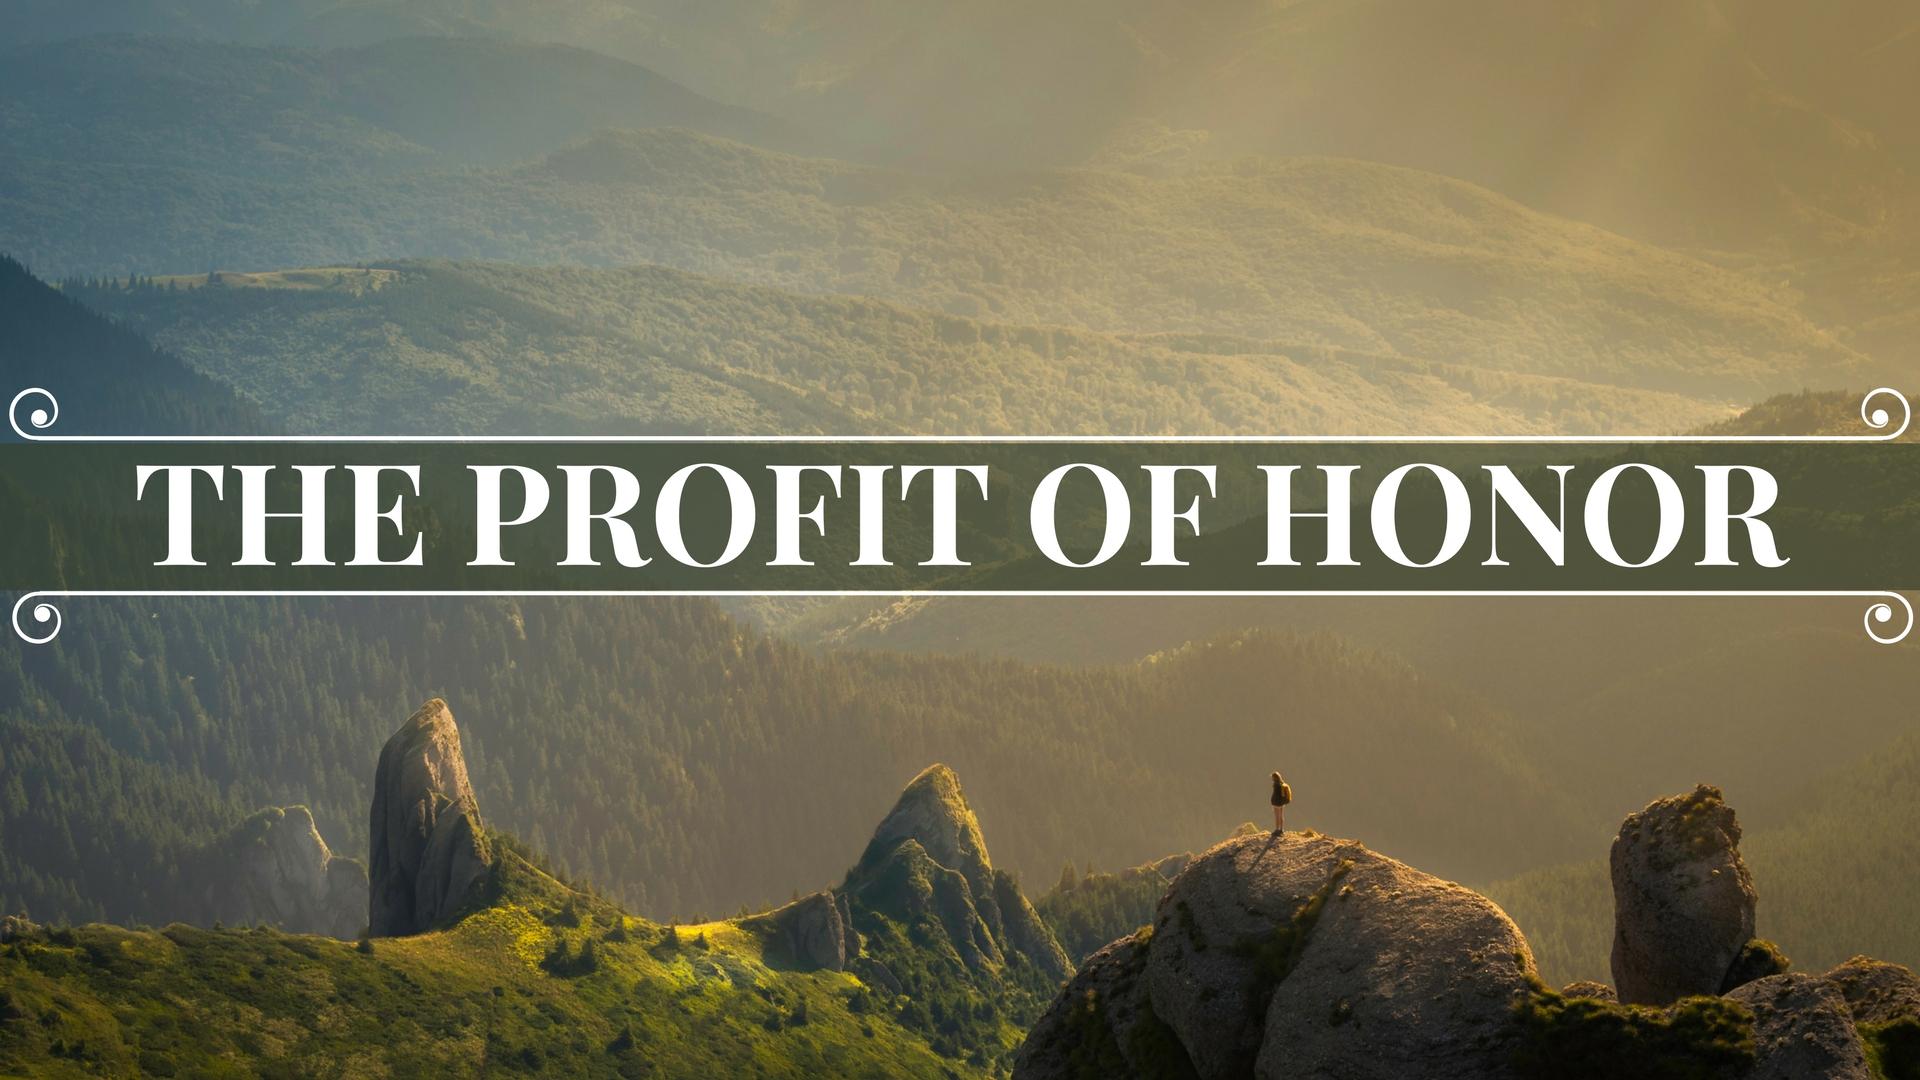 THE PROFIT OF HONOR2.jpg